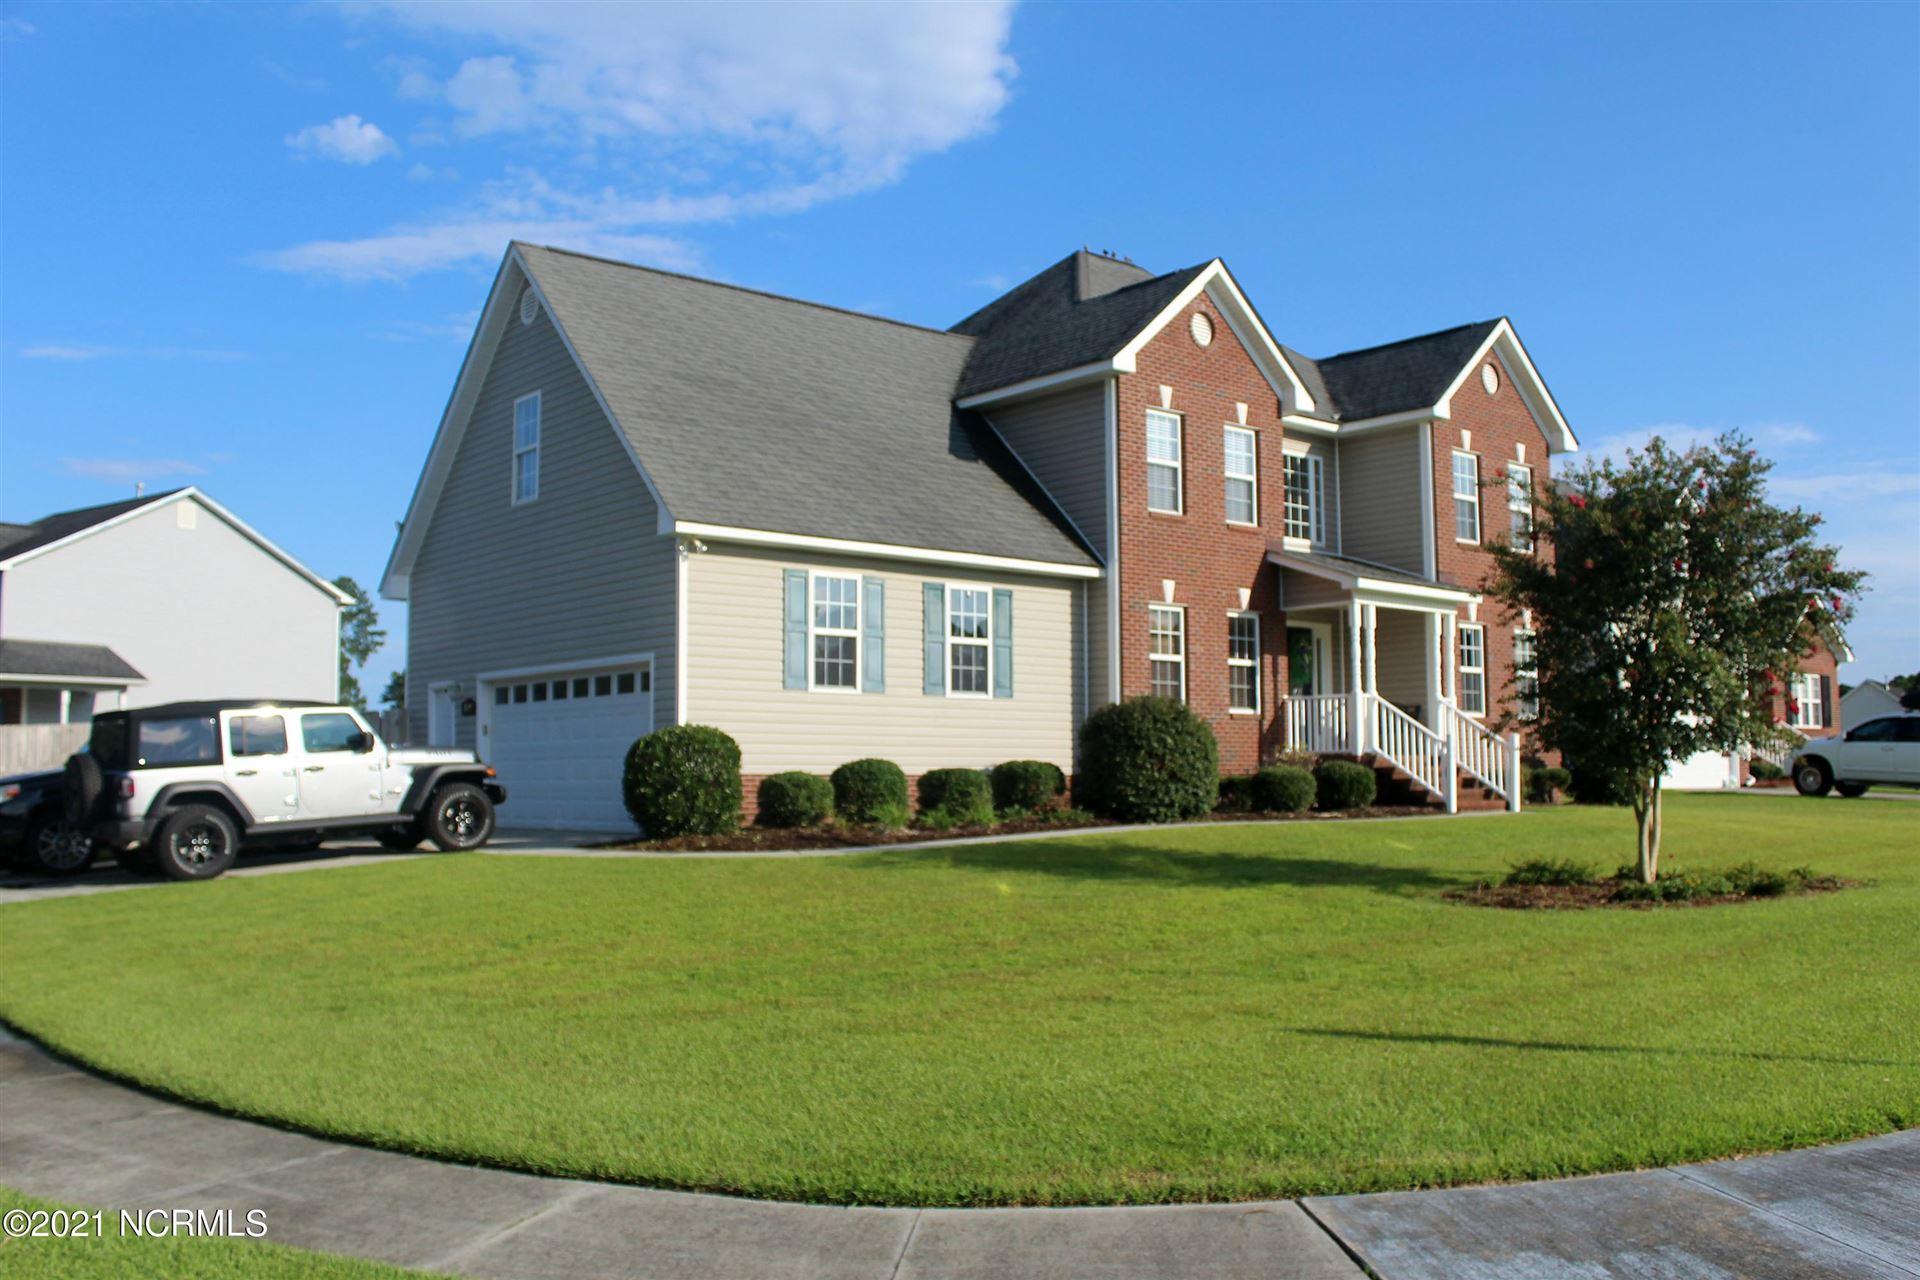 Photo of 109 Edgefield Drive, Jacksonville, NC 28546 (MLS # 100287477)